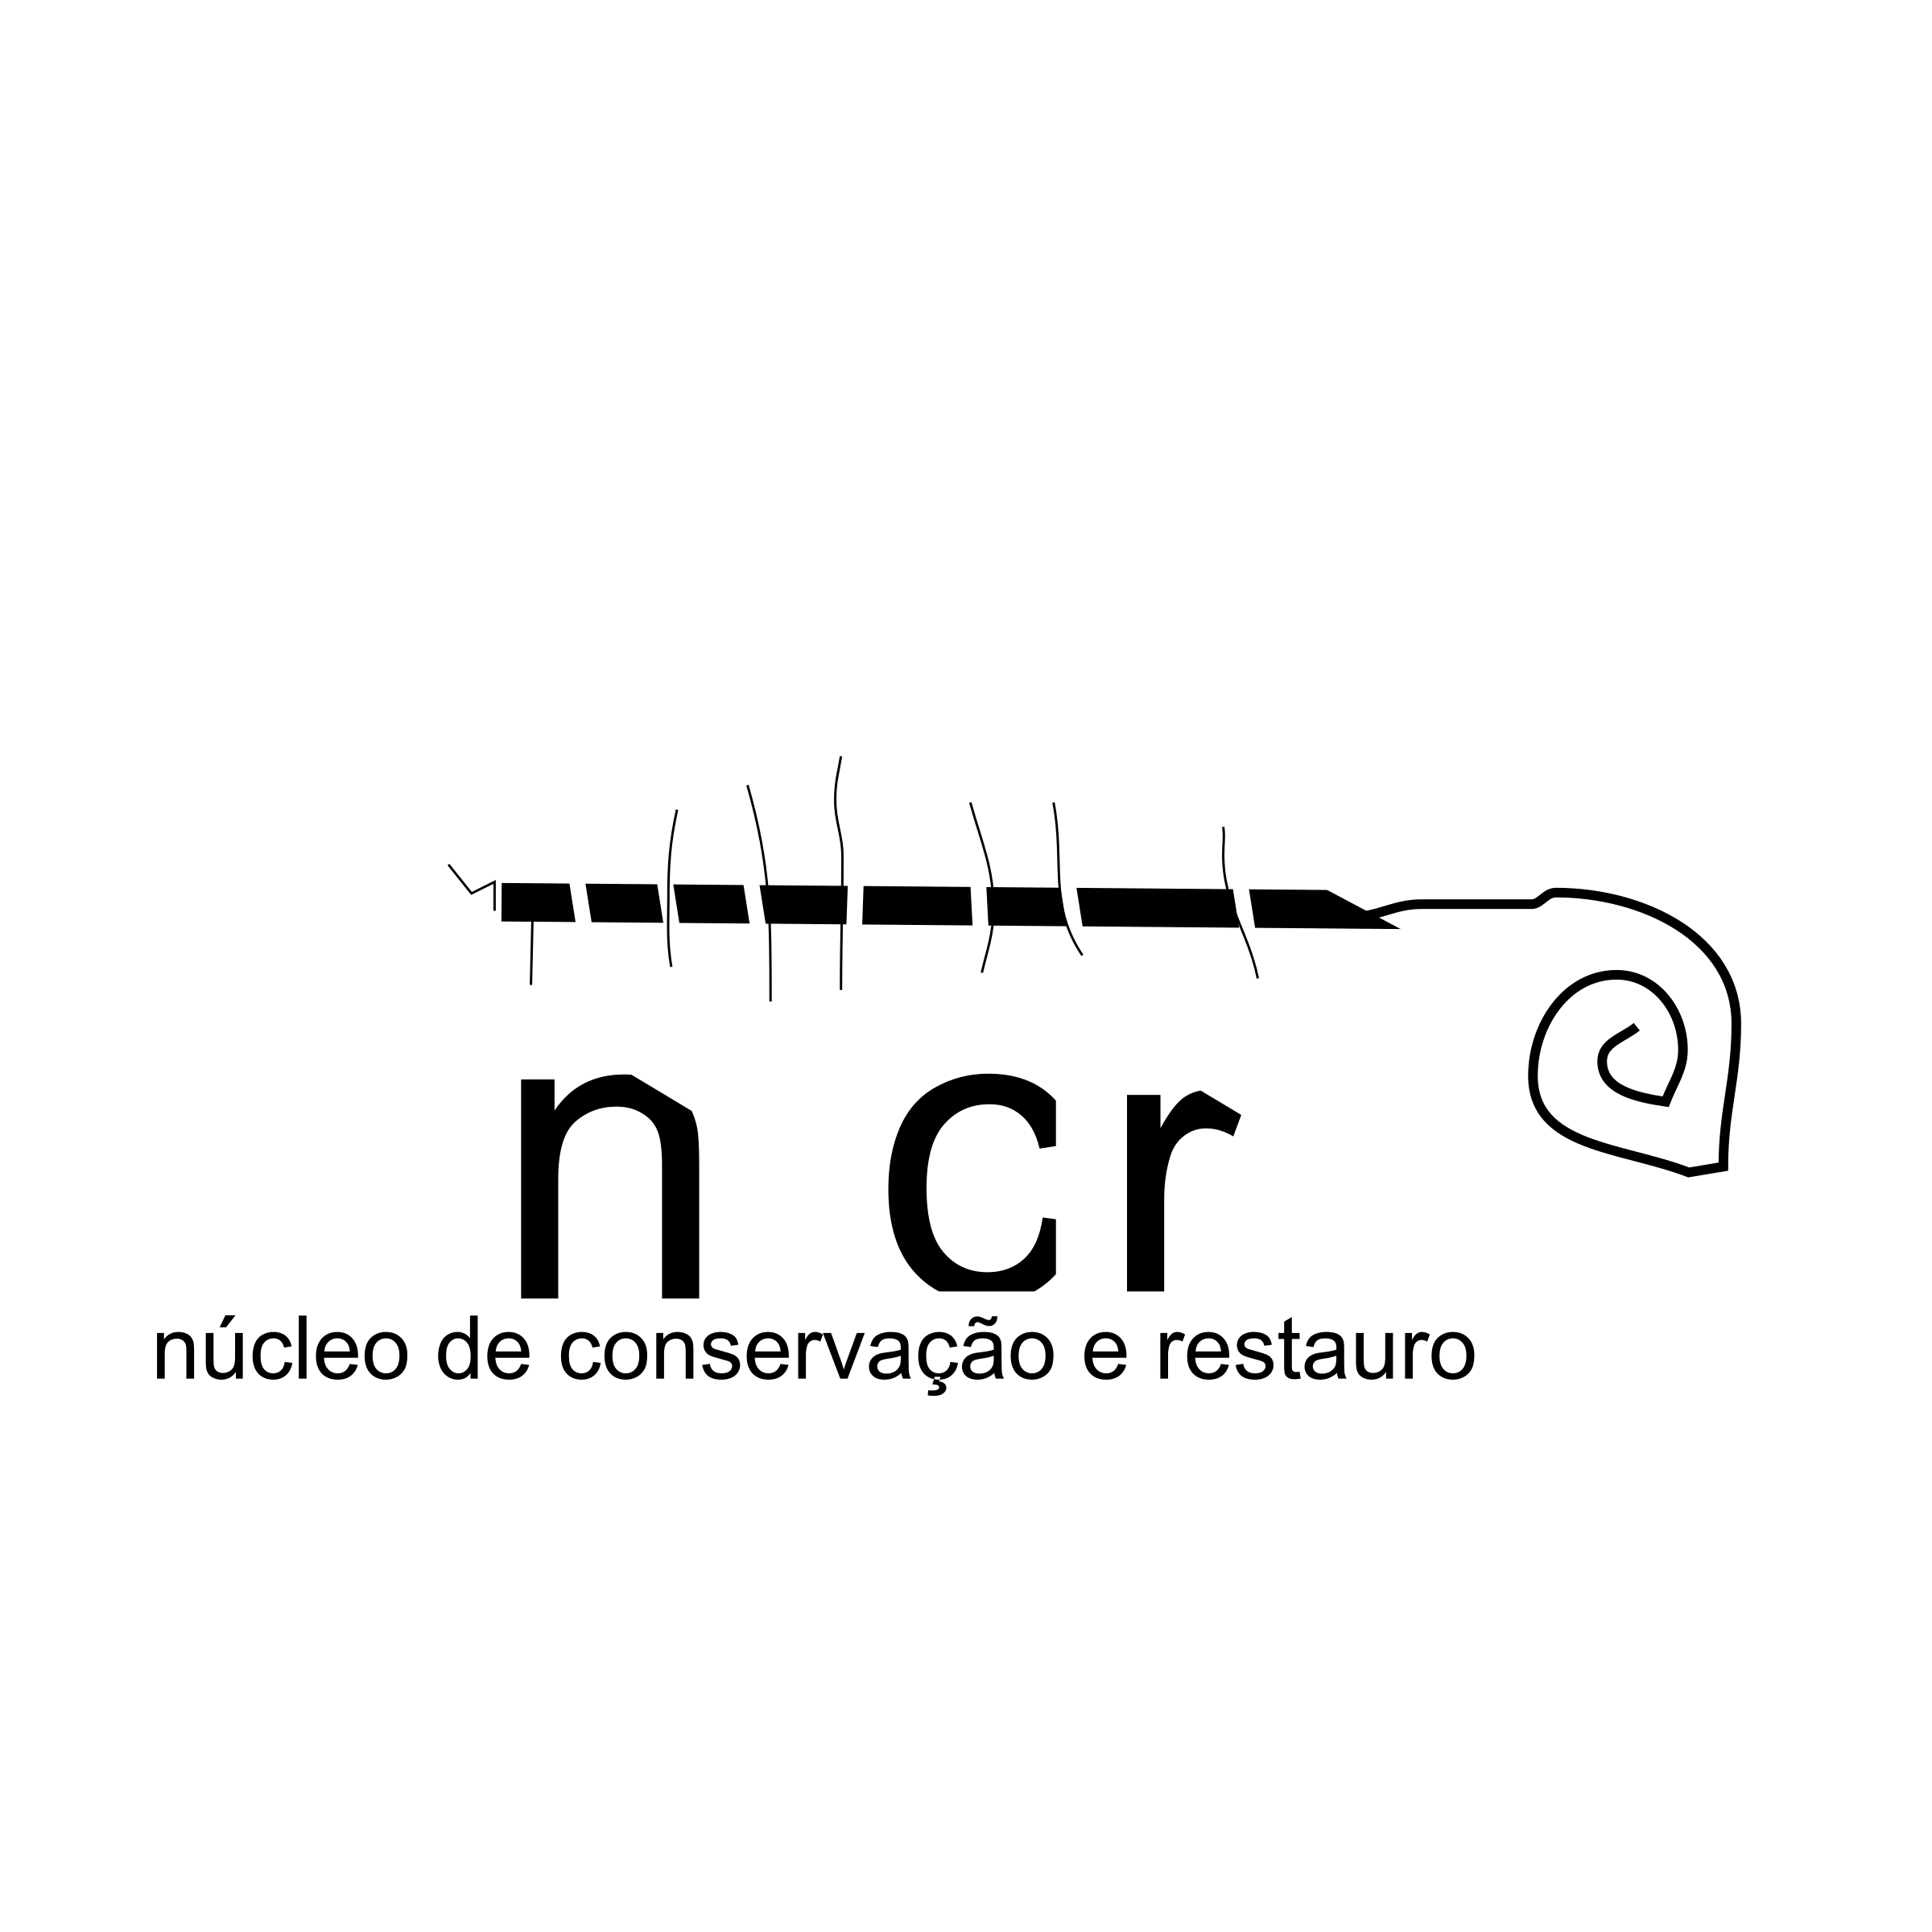 NCR Logo PNG Transparent